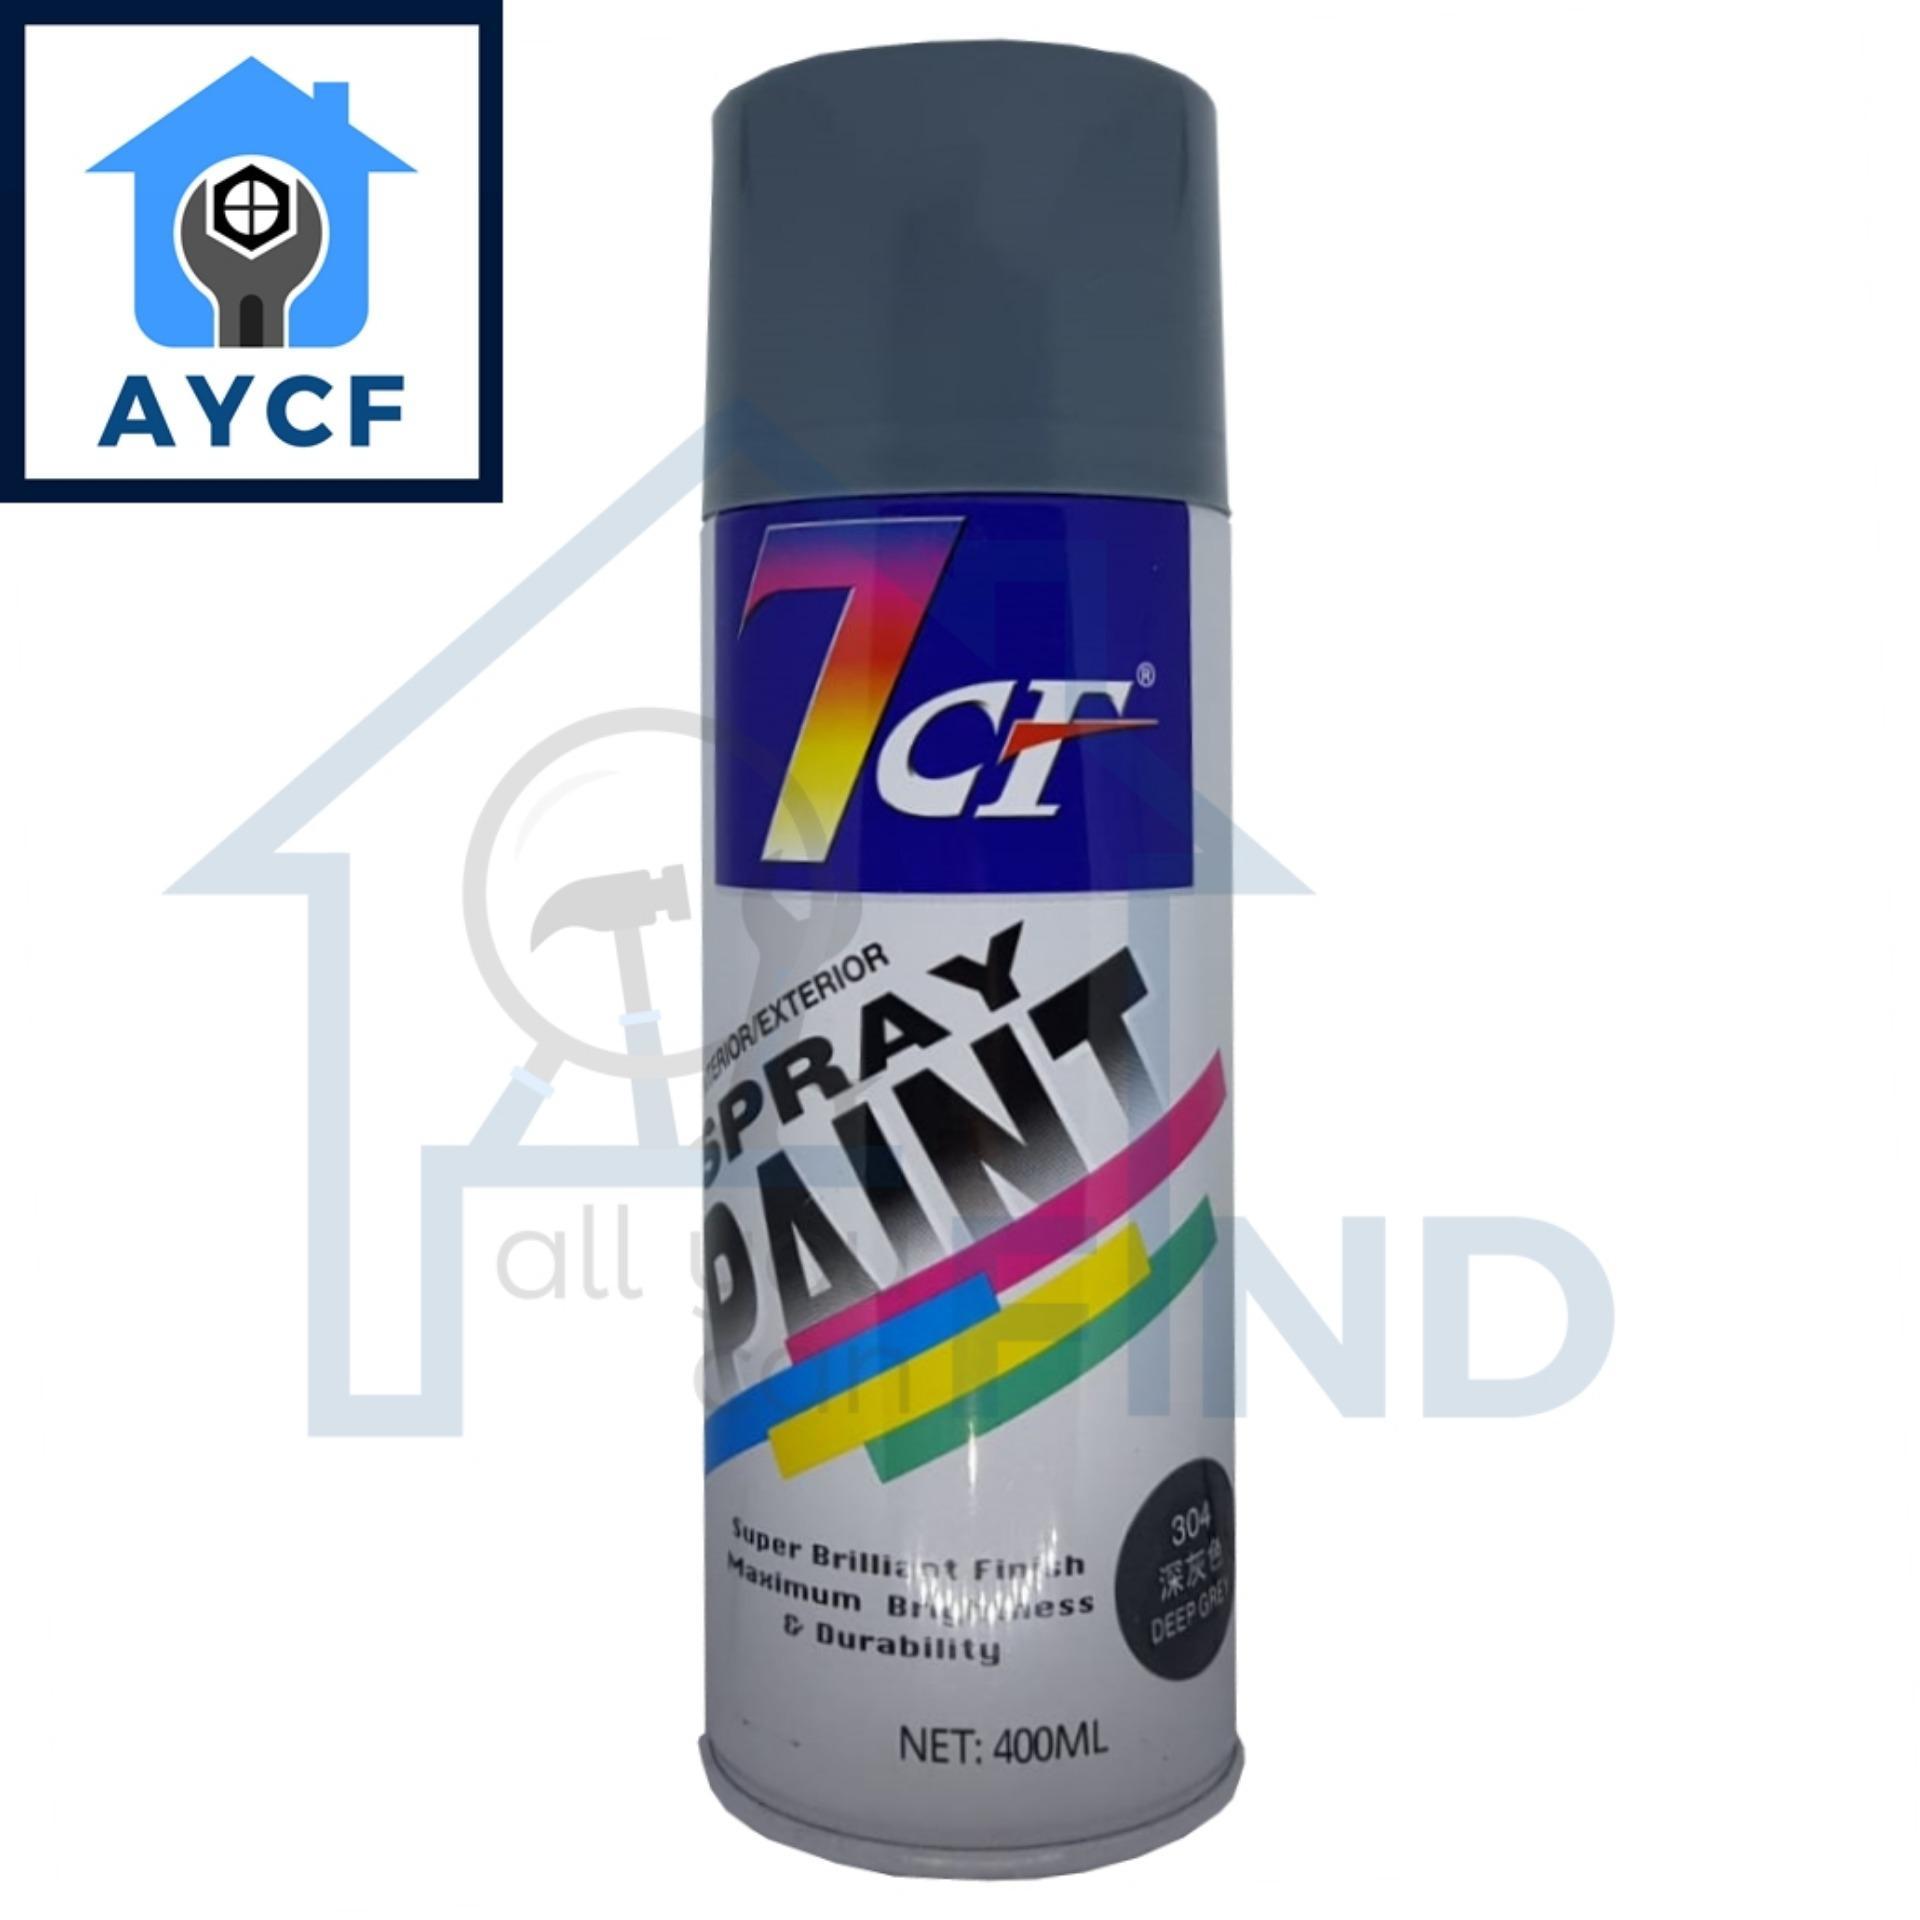 7CF Interior / Exterior Spray Paint 400ml - Deep Grey